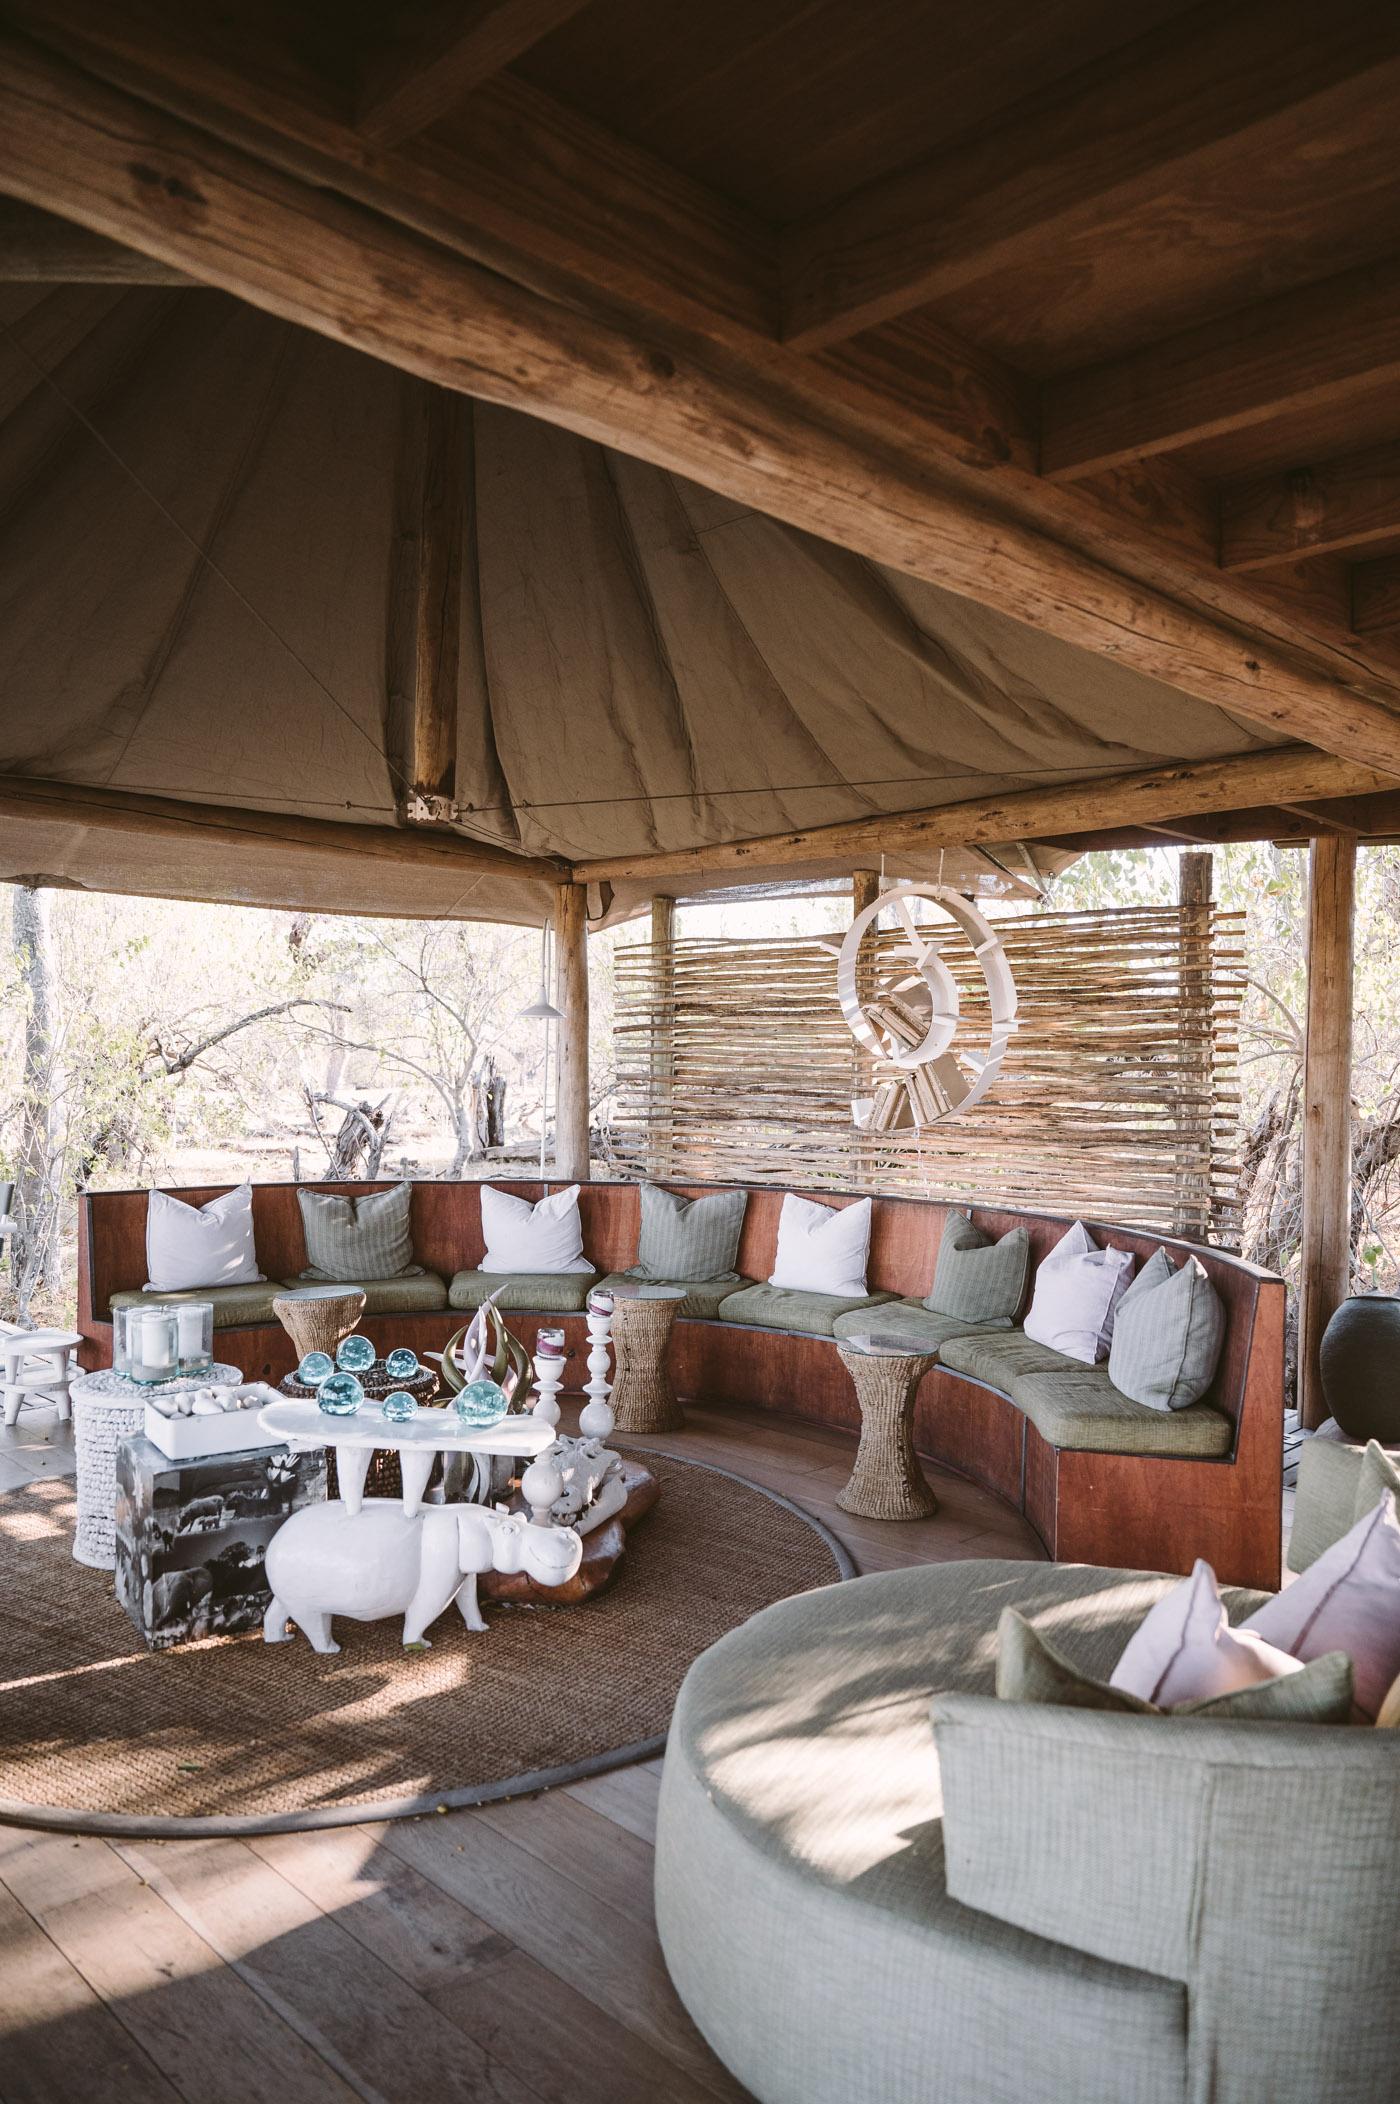 andBeyond Xaranna Okavango Delta Camp lounge area